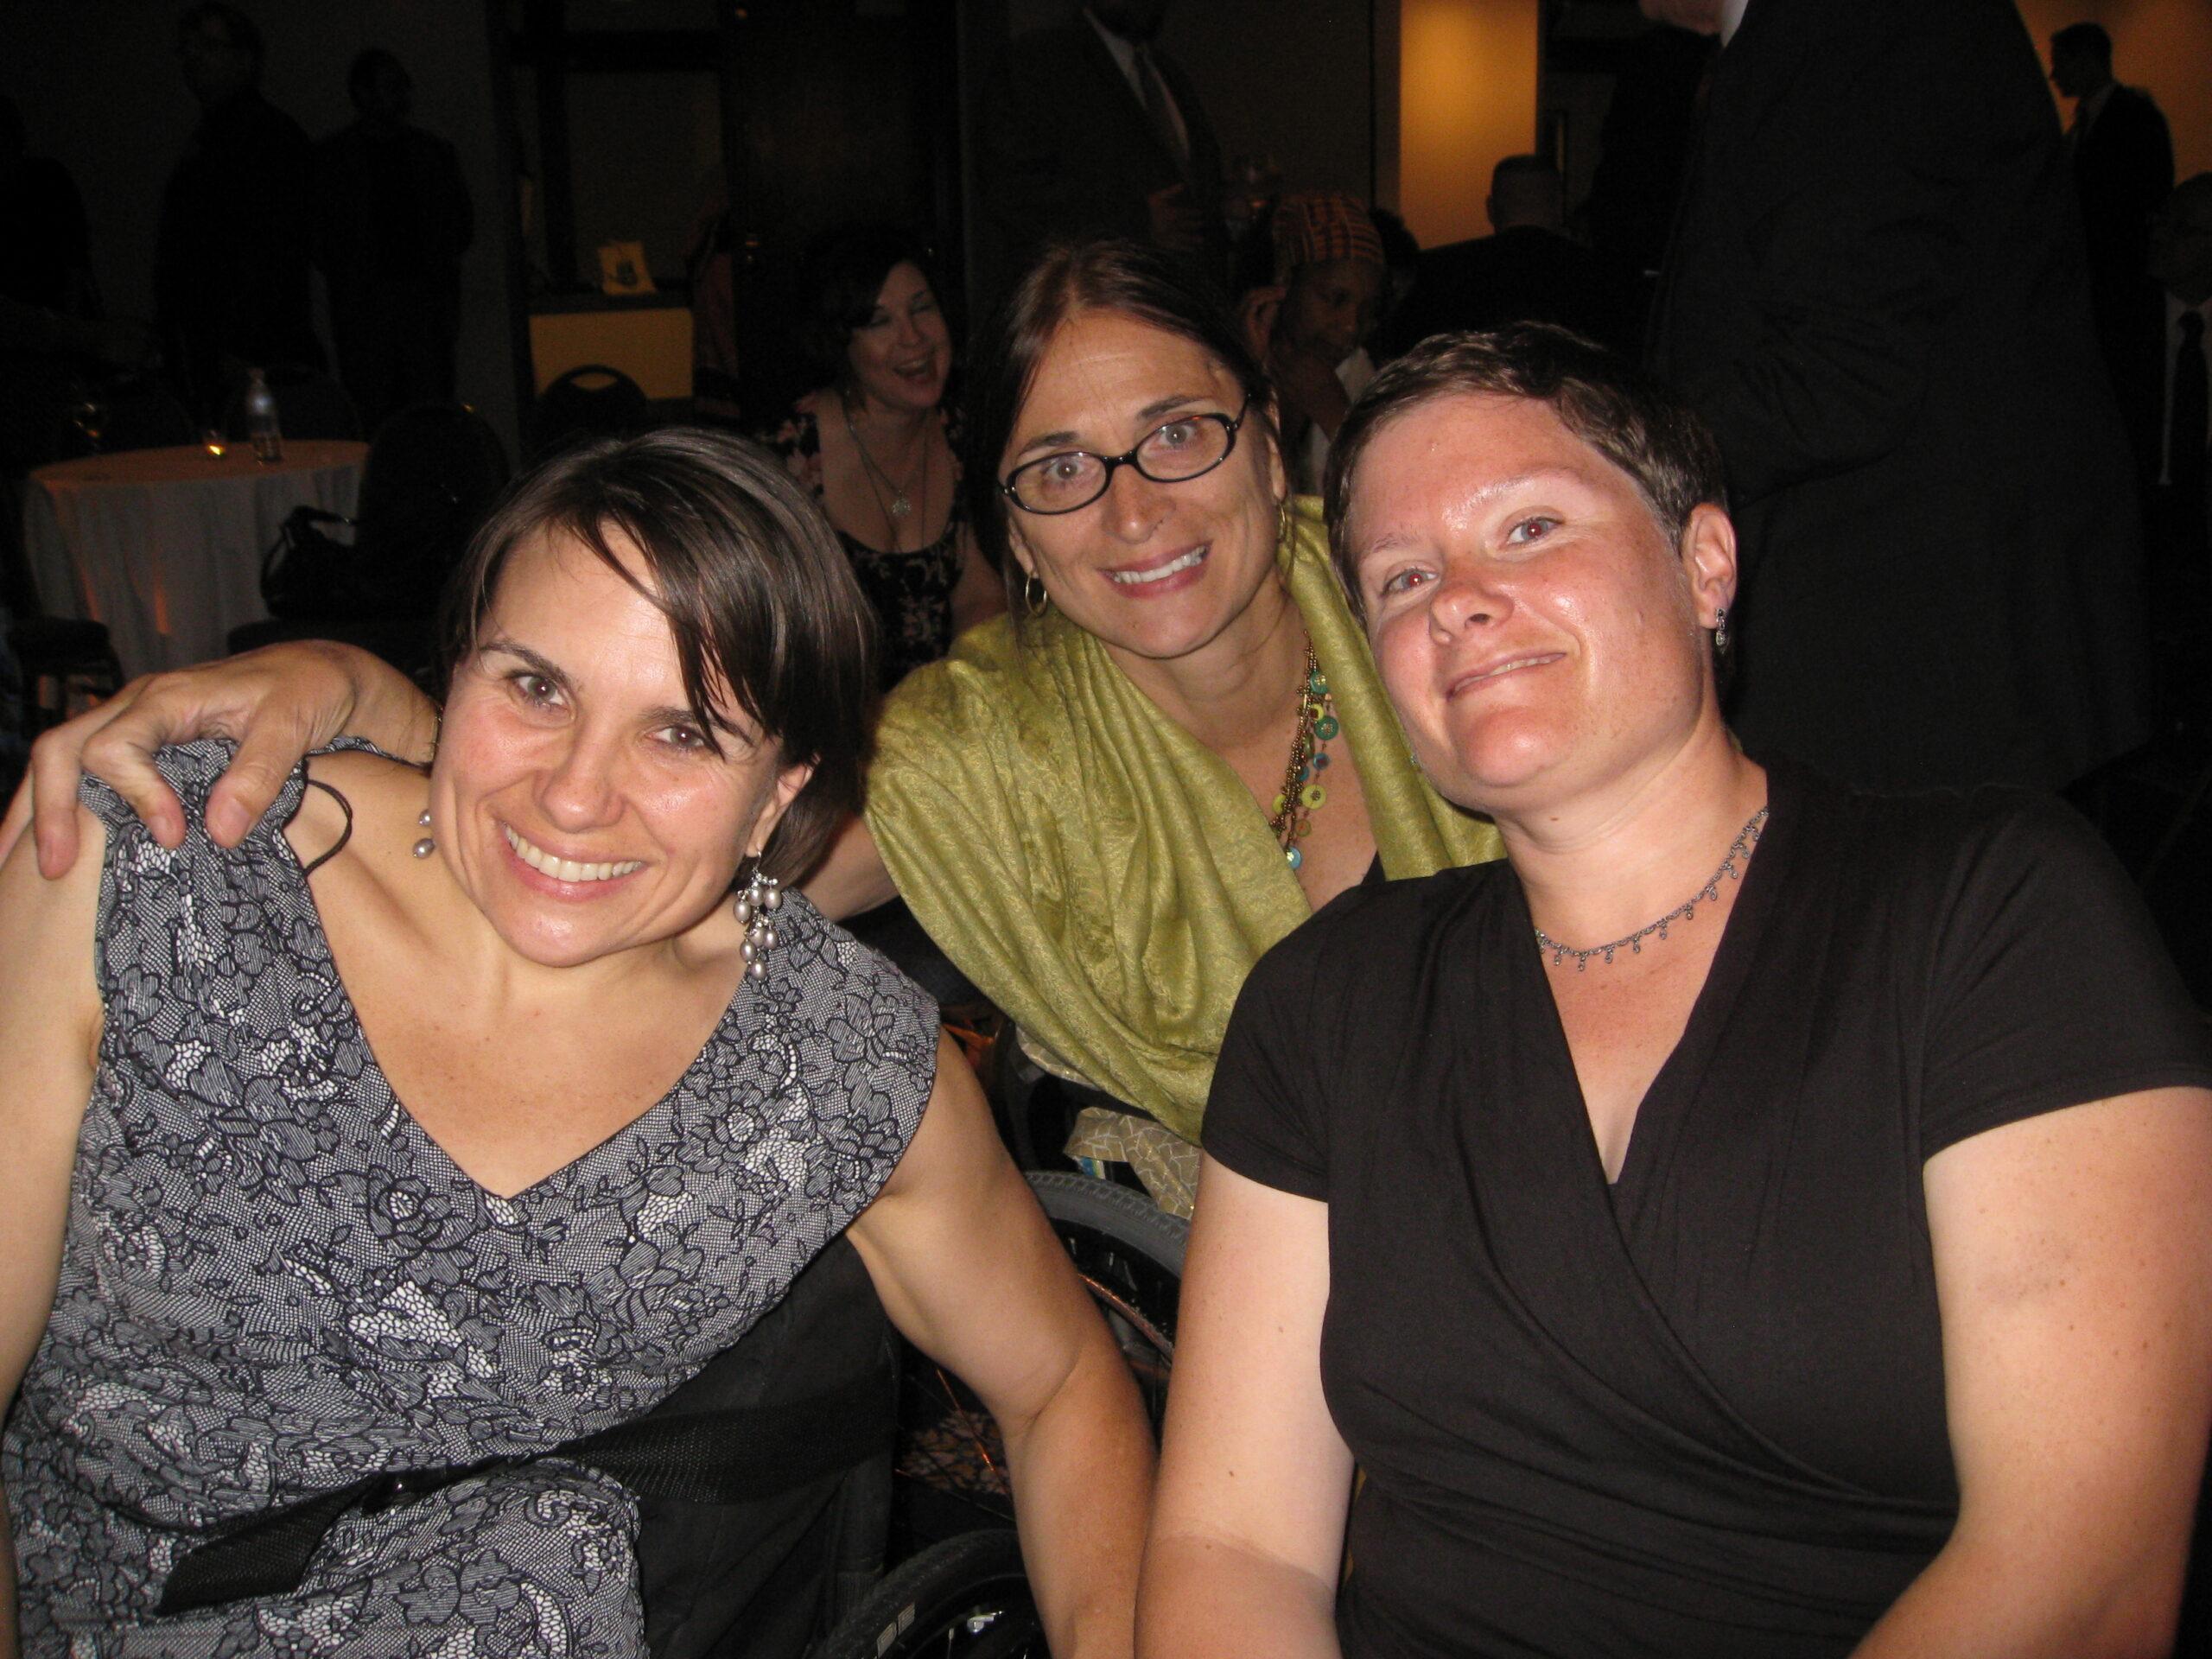 Karen Tamley, Marca Bristo and Daisy Feidt